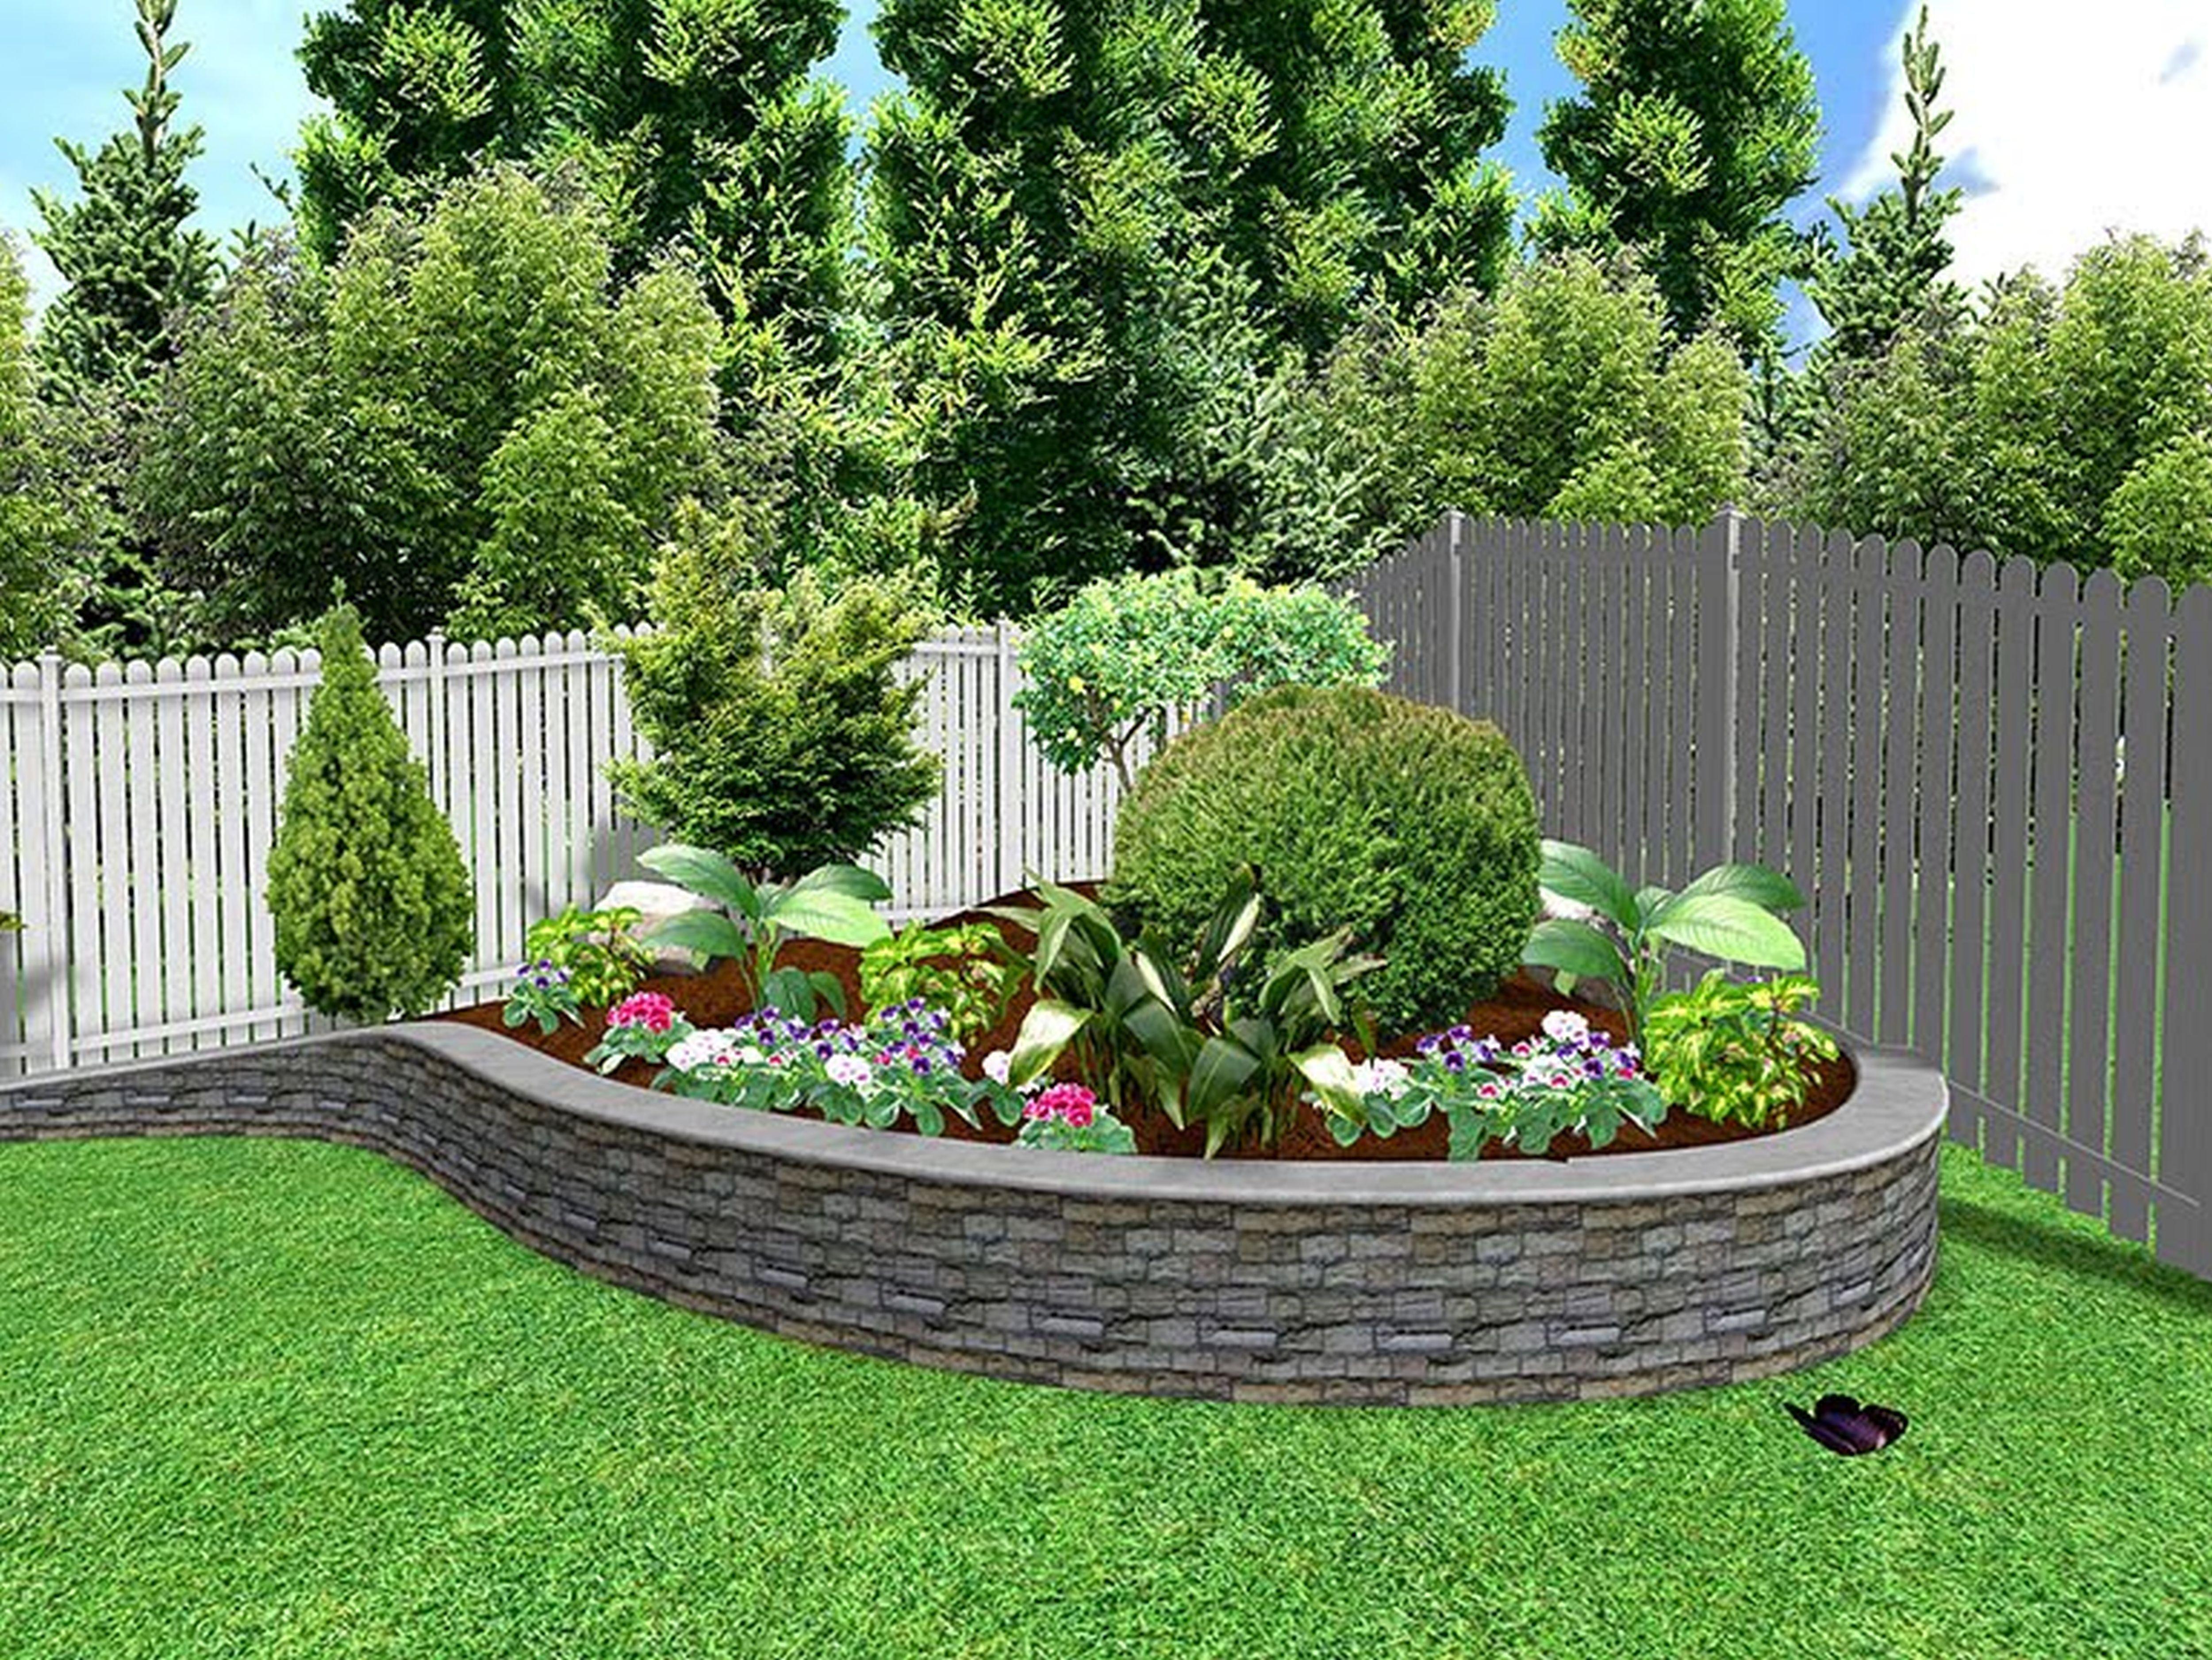 Awesome Landscaping Ideas On A Budget Handsome Landscaping Inspiration Foxy Landscaping Ideas For Driveways M Kebun Kecil Desain Taman Pertamanan Halaman Depan